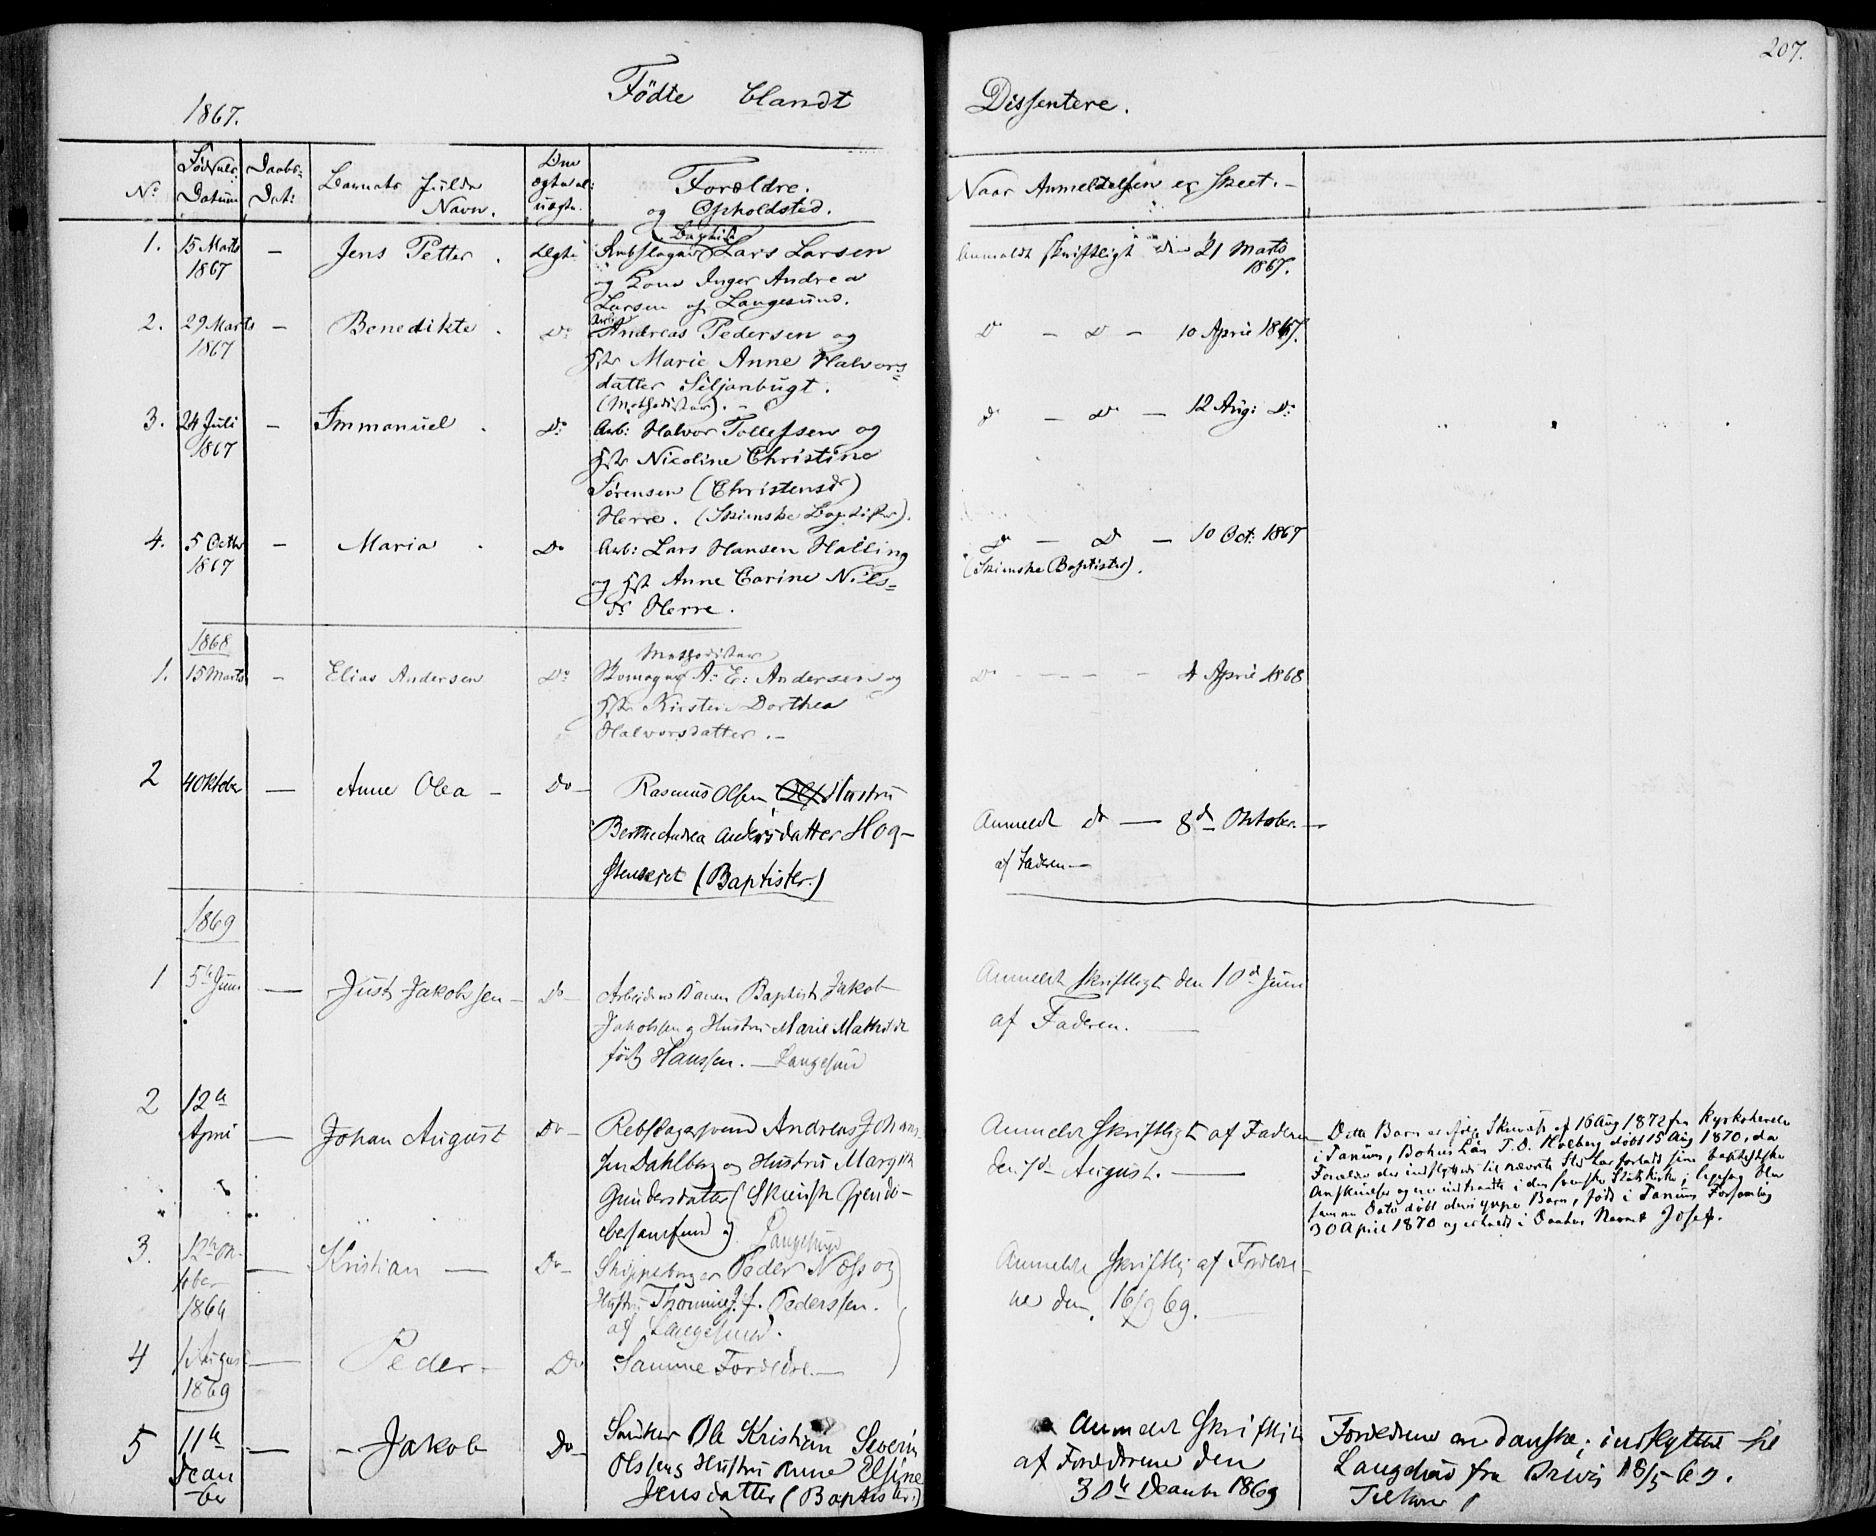 SAKO, Bamble kirkebøker, F/Fa/L0005: Ministerialbok nr. I 5, 1854-1869, s. 207